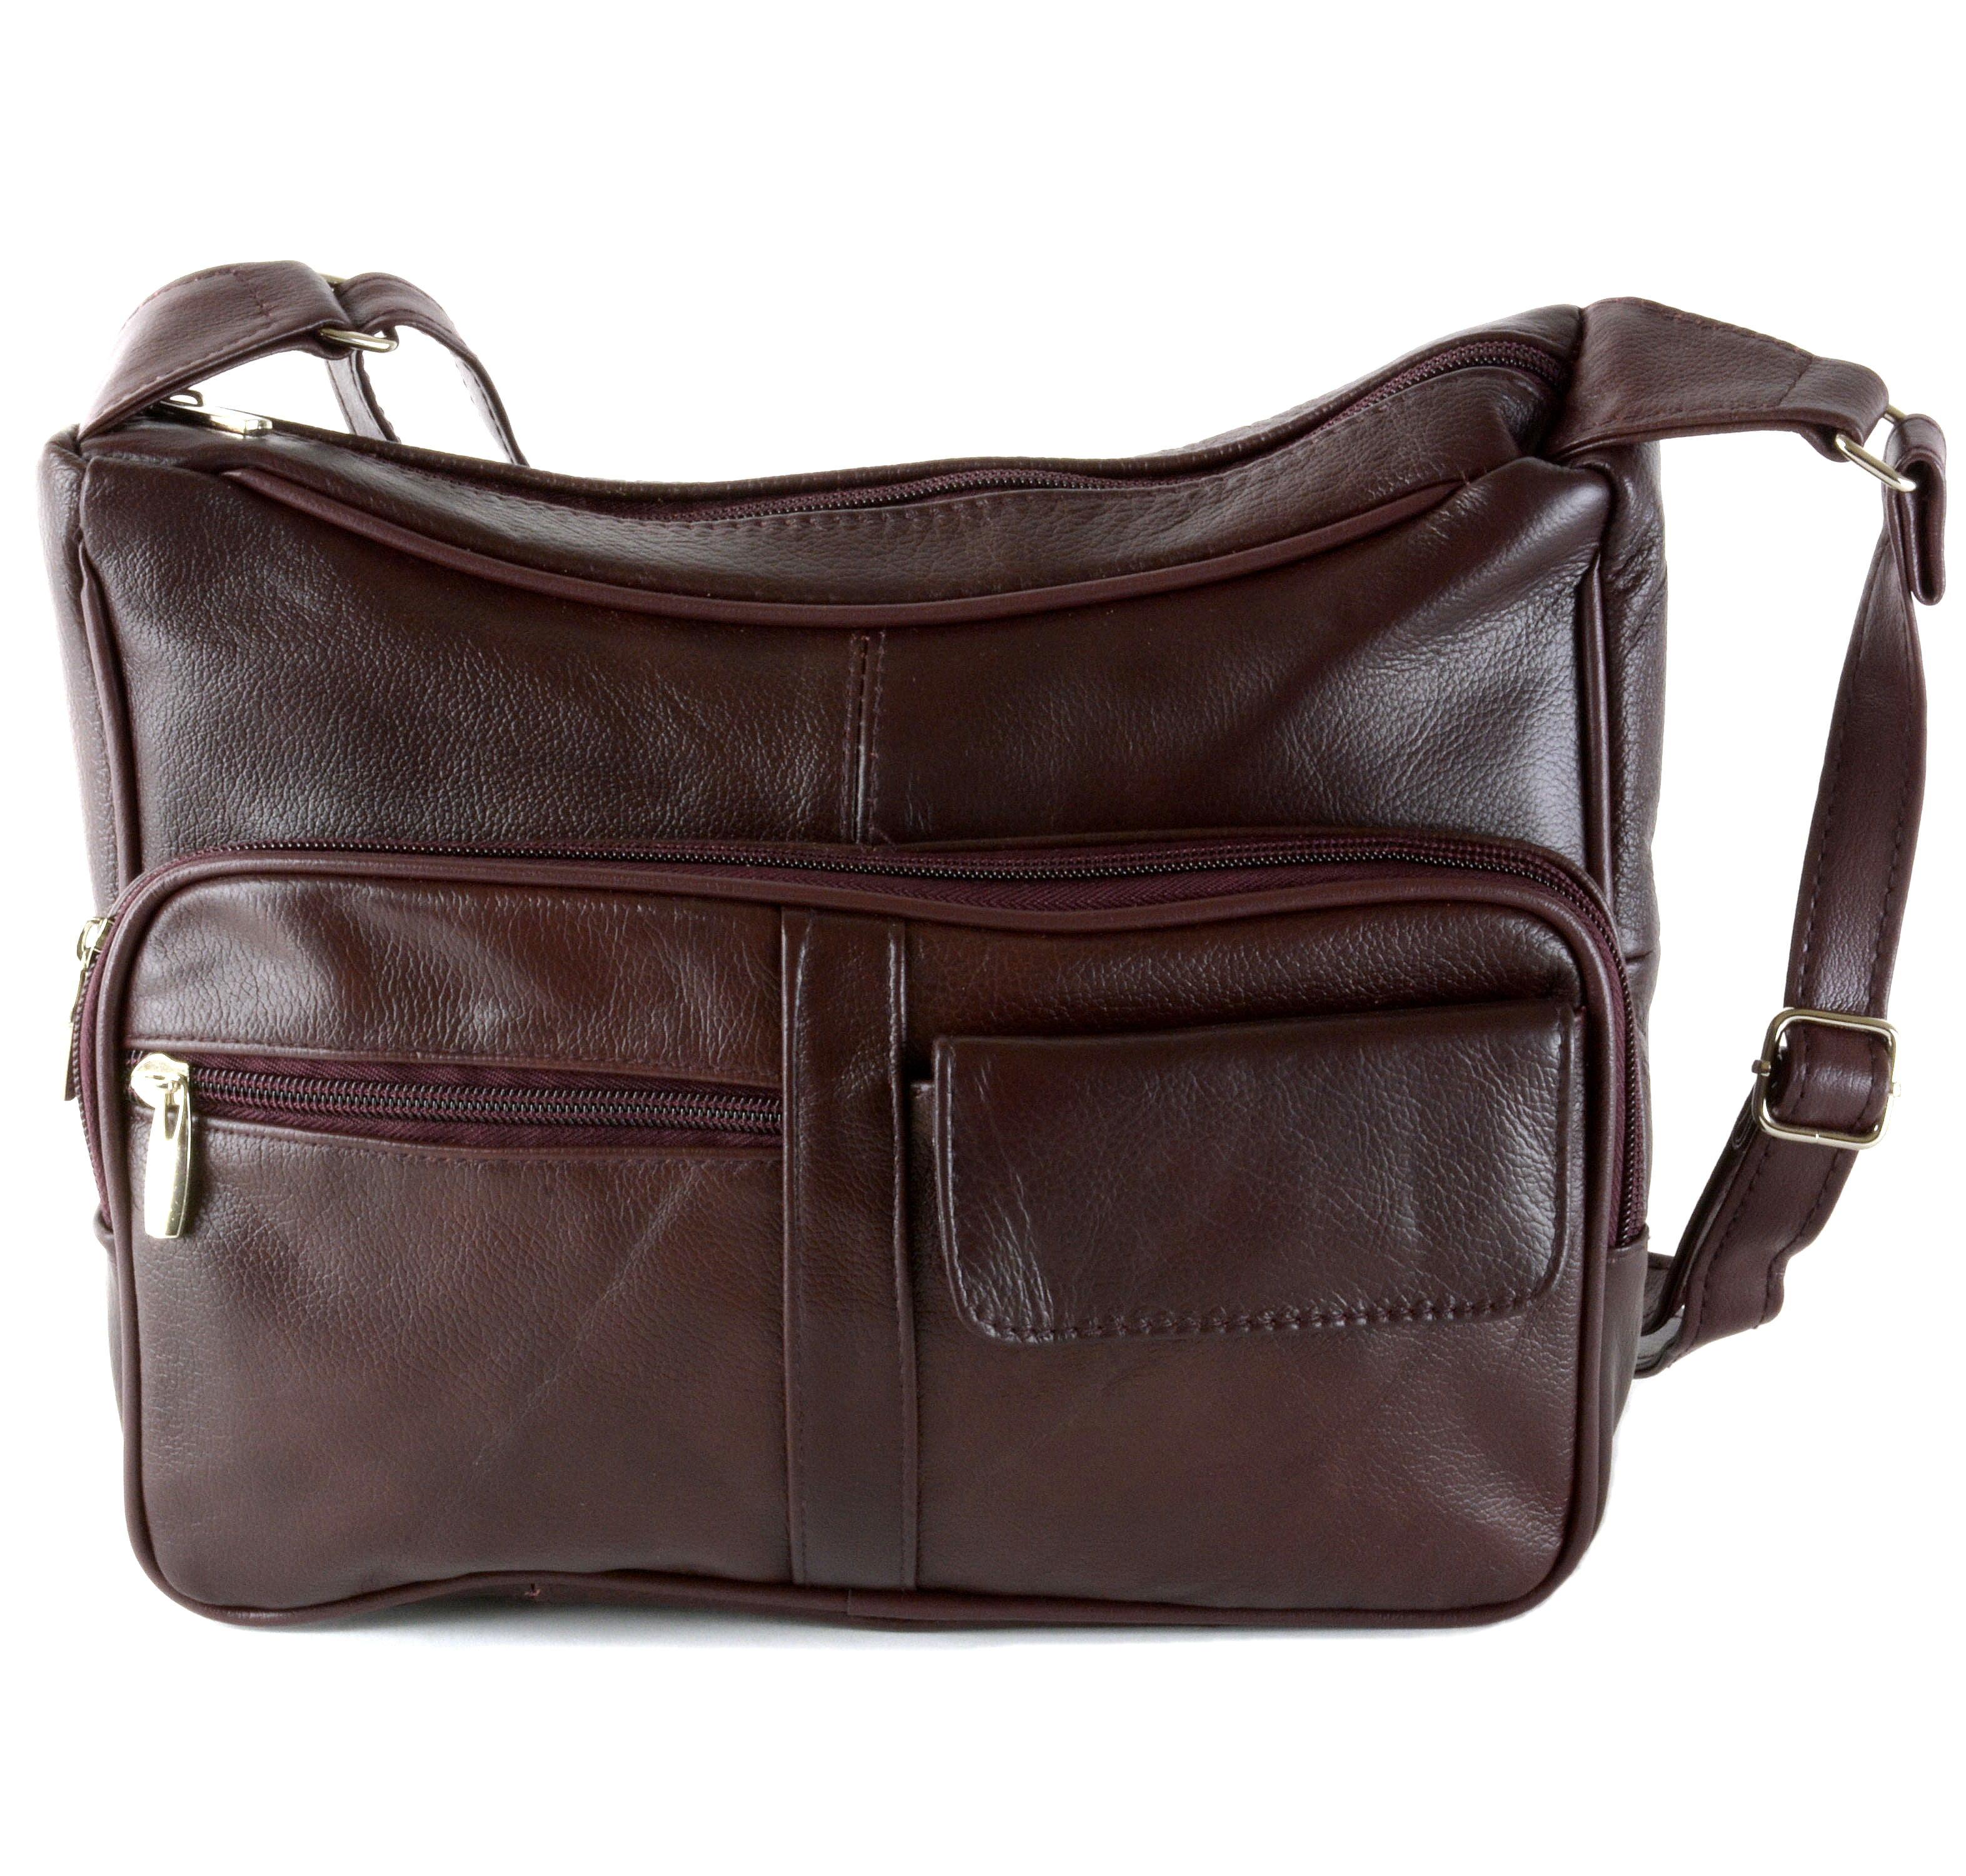 Women s Leather Organizer Purse Shoulder Bag Multiple Pockets Cross Body  Handbag f83c091aecd60